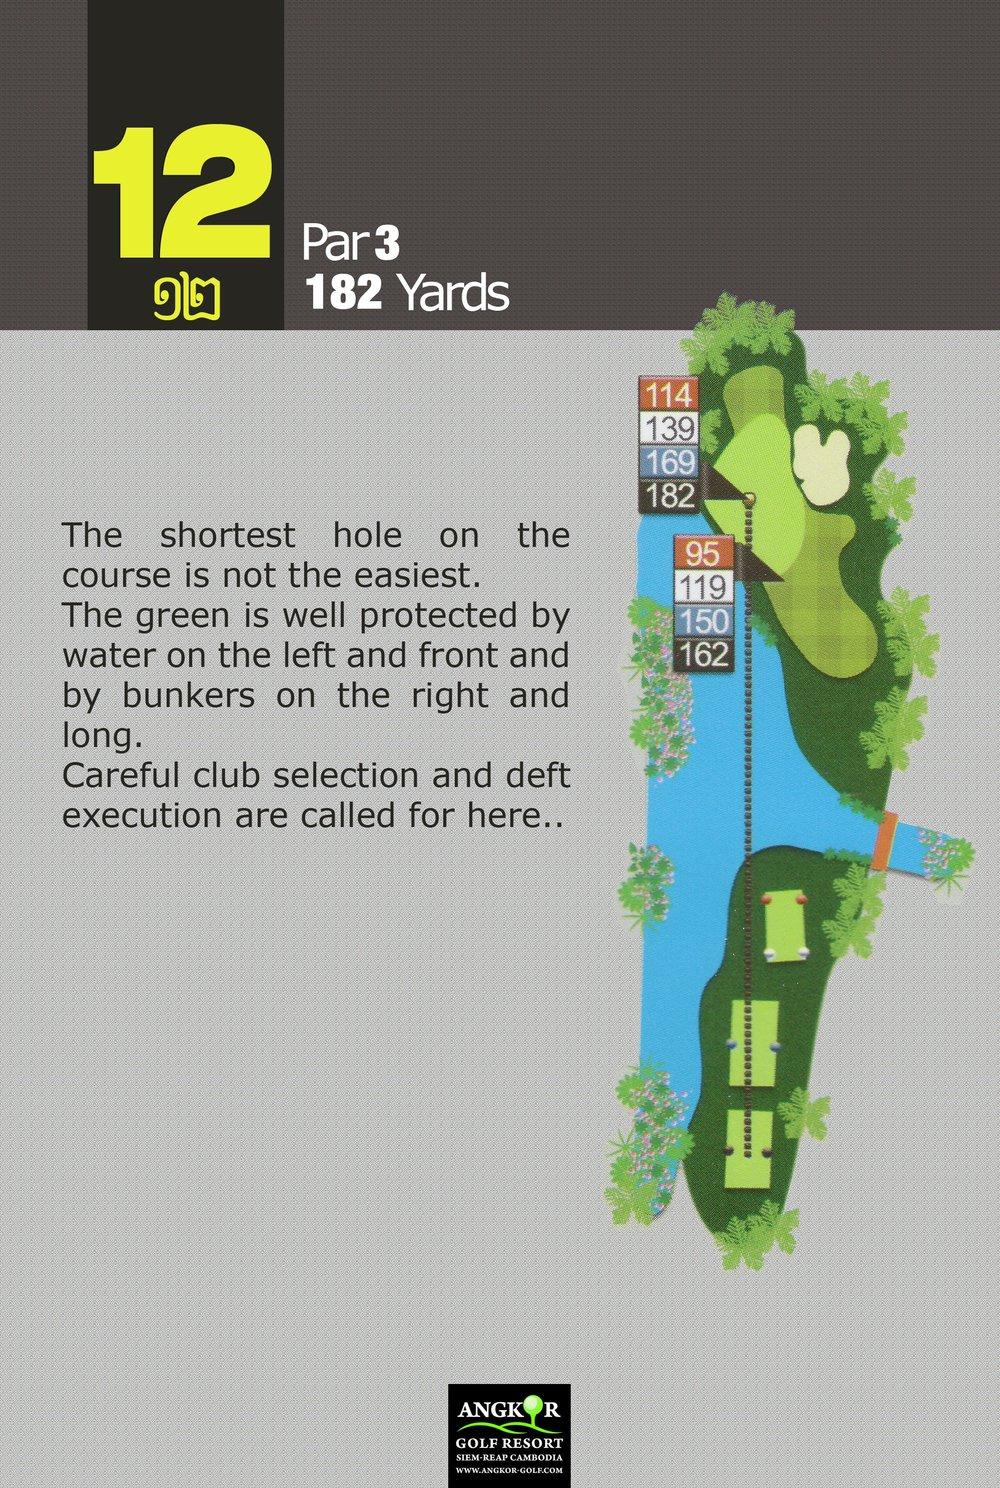 Hole 12 - Par 3 182 Yards